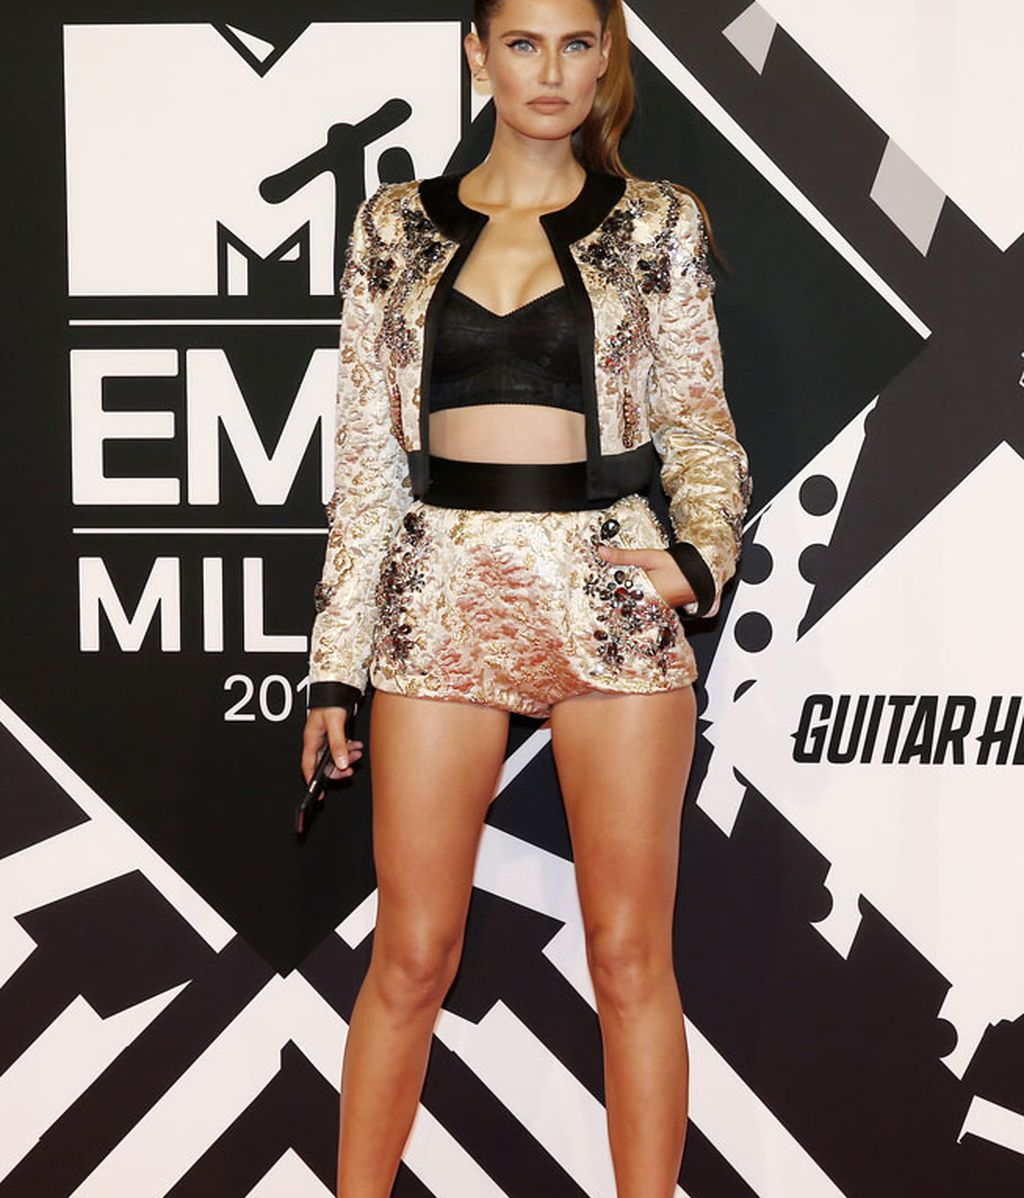 Crop top y shorts: Bianca Balti style